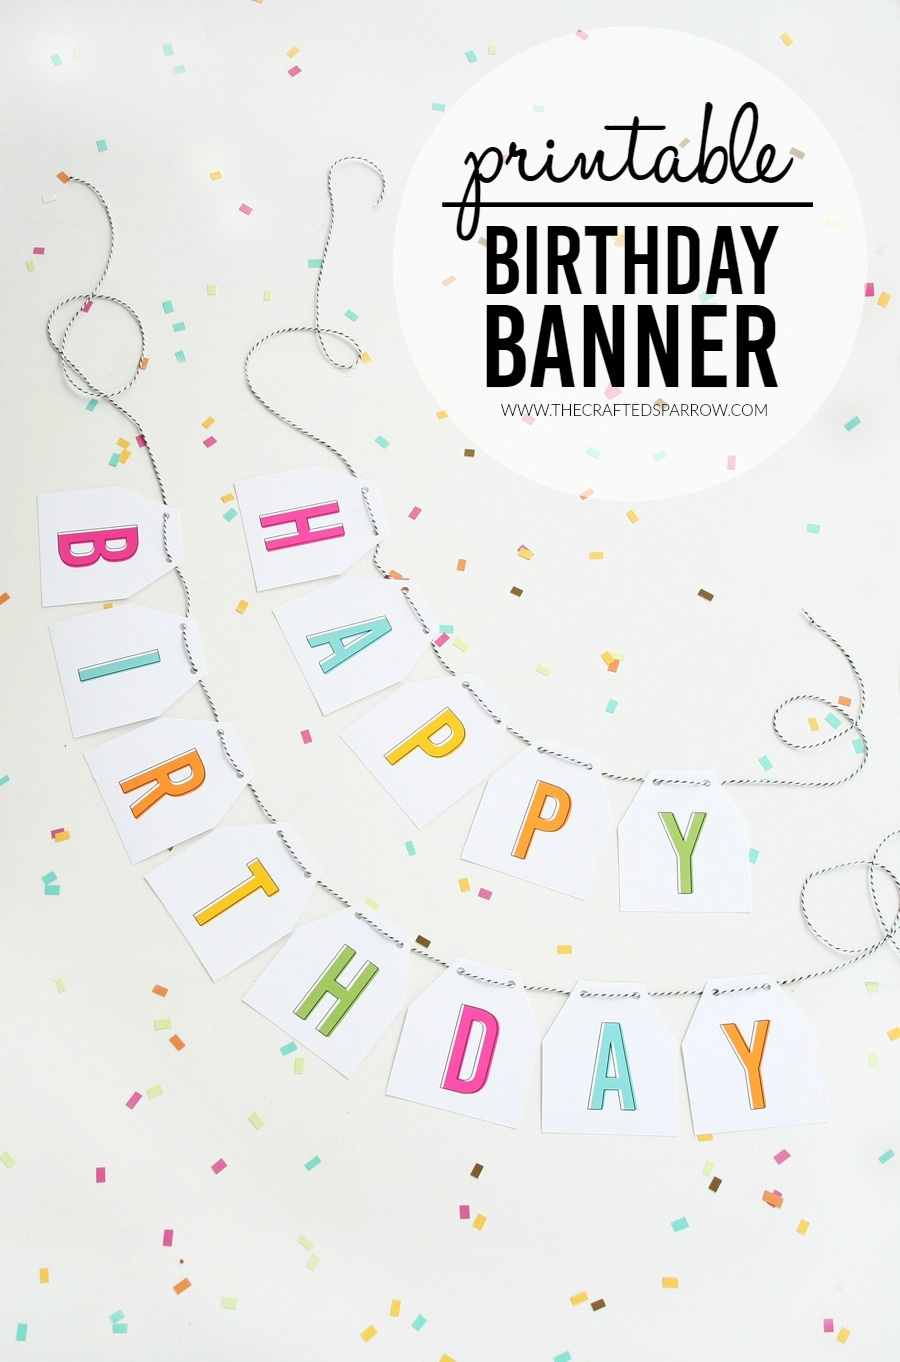 Free Printable Birthday Banner - Free Printable Happy Birthday Banner